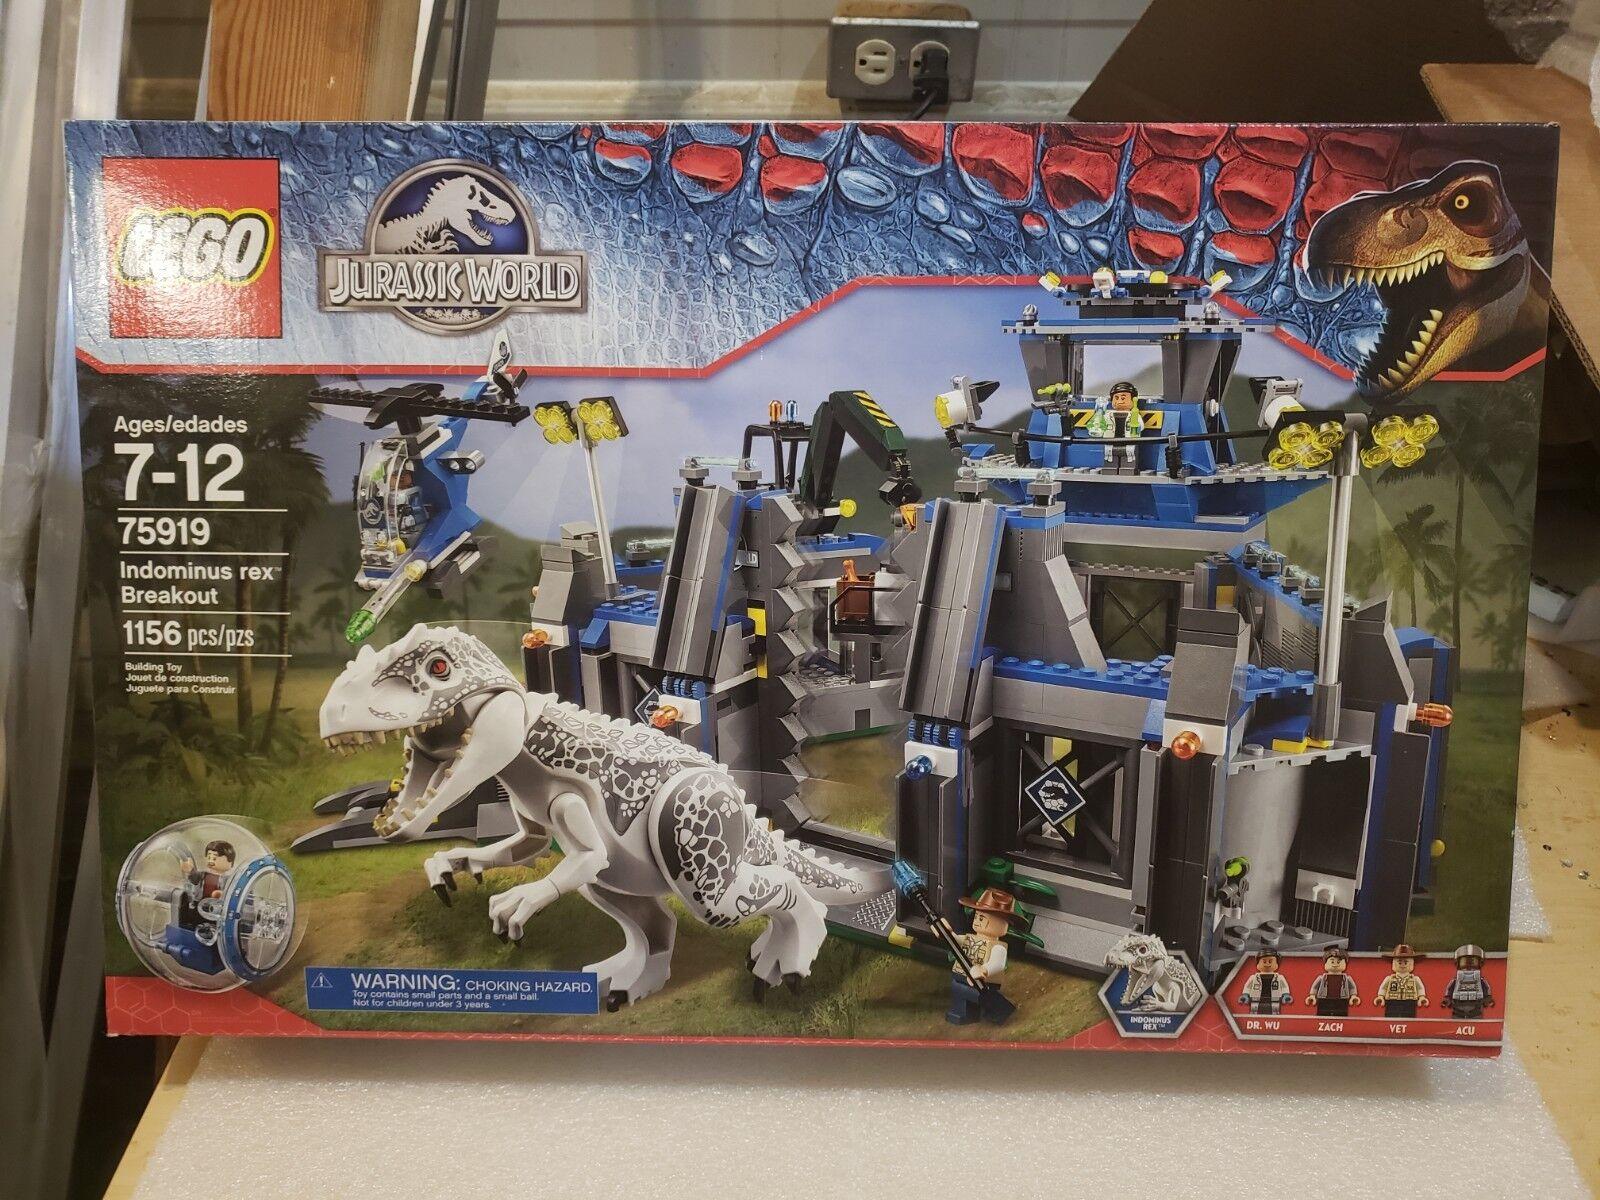 Breakout Jurassic 75919 Lego Rex Retired Indominus Nisb World oedCxrB